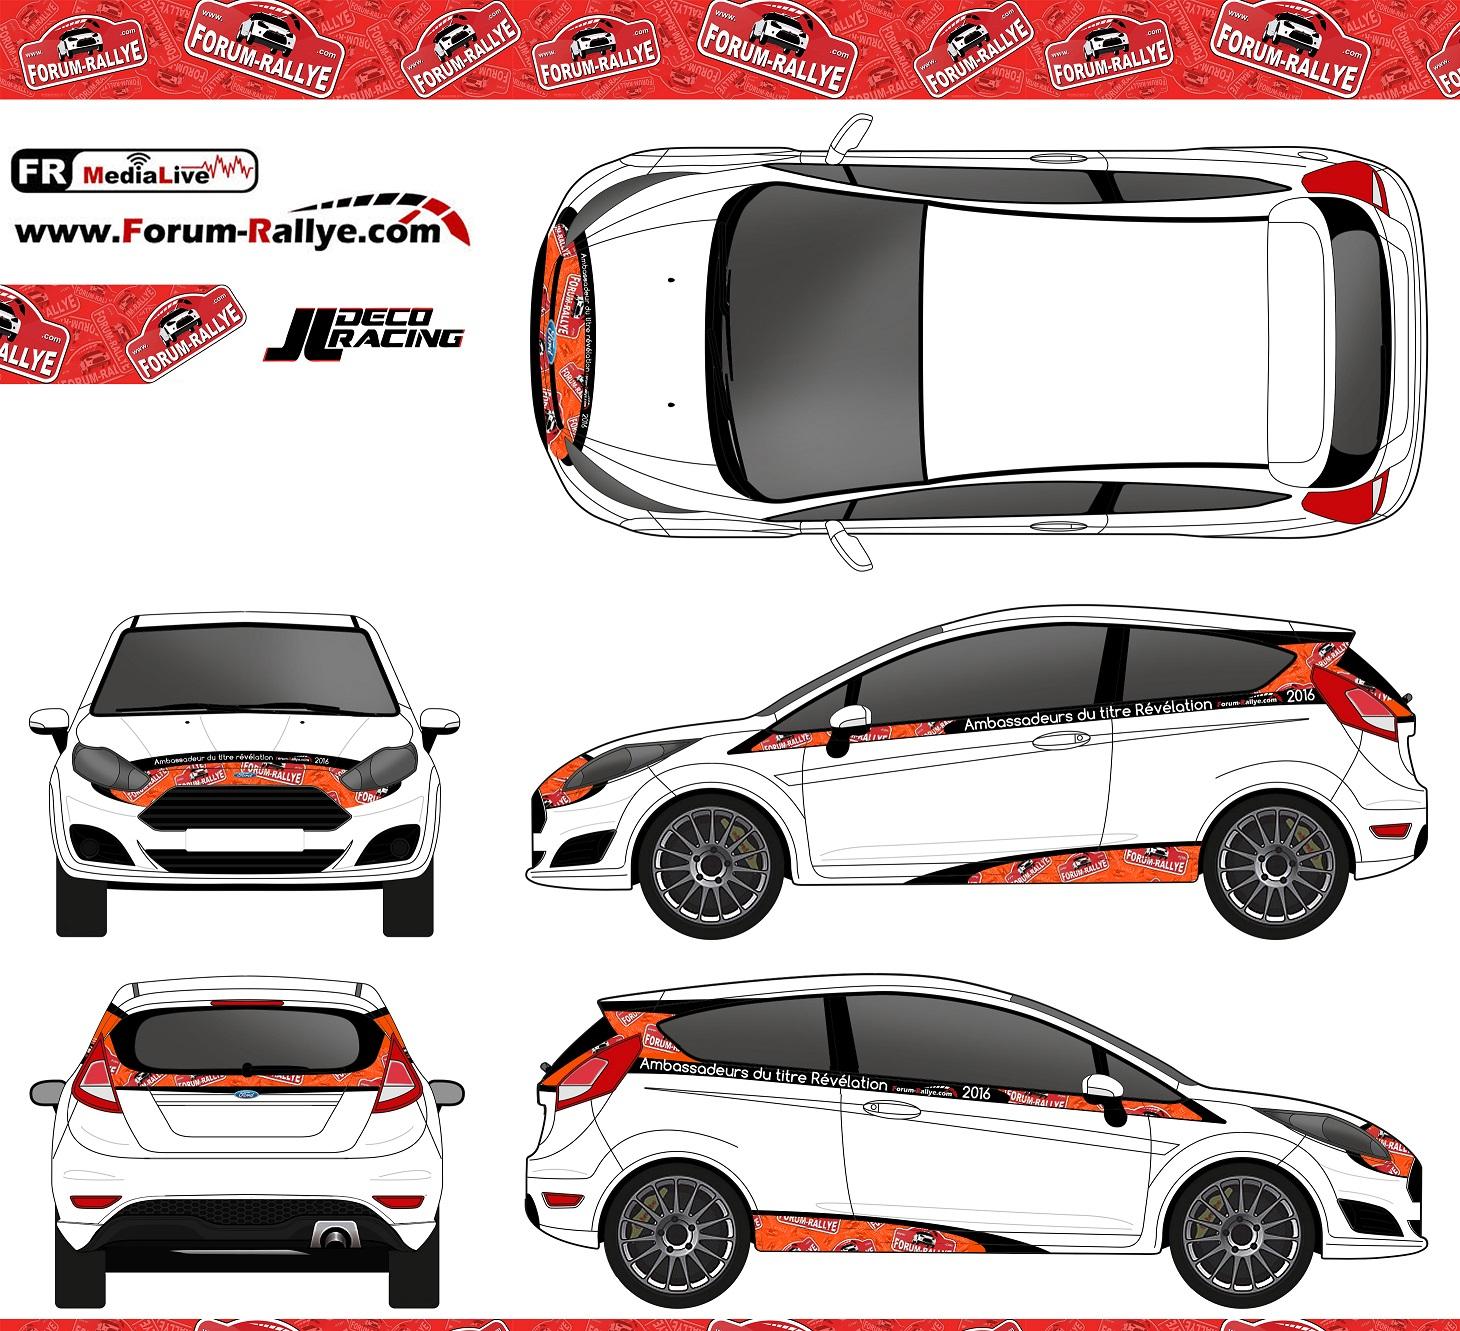 Fiesta R2t FR v5 plaques ok - Copie.jpg